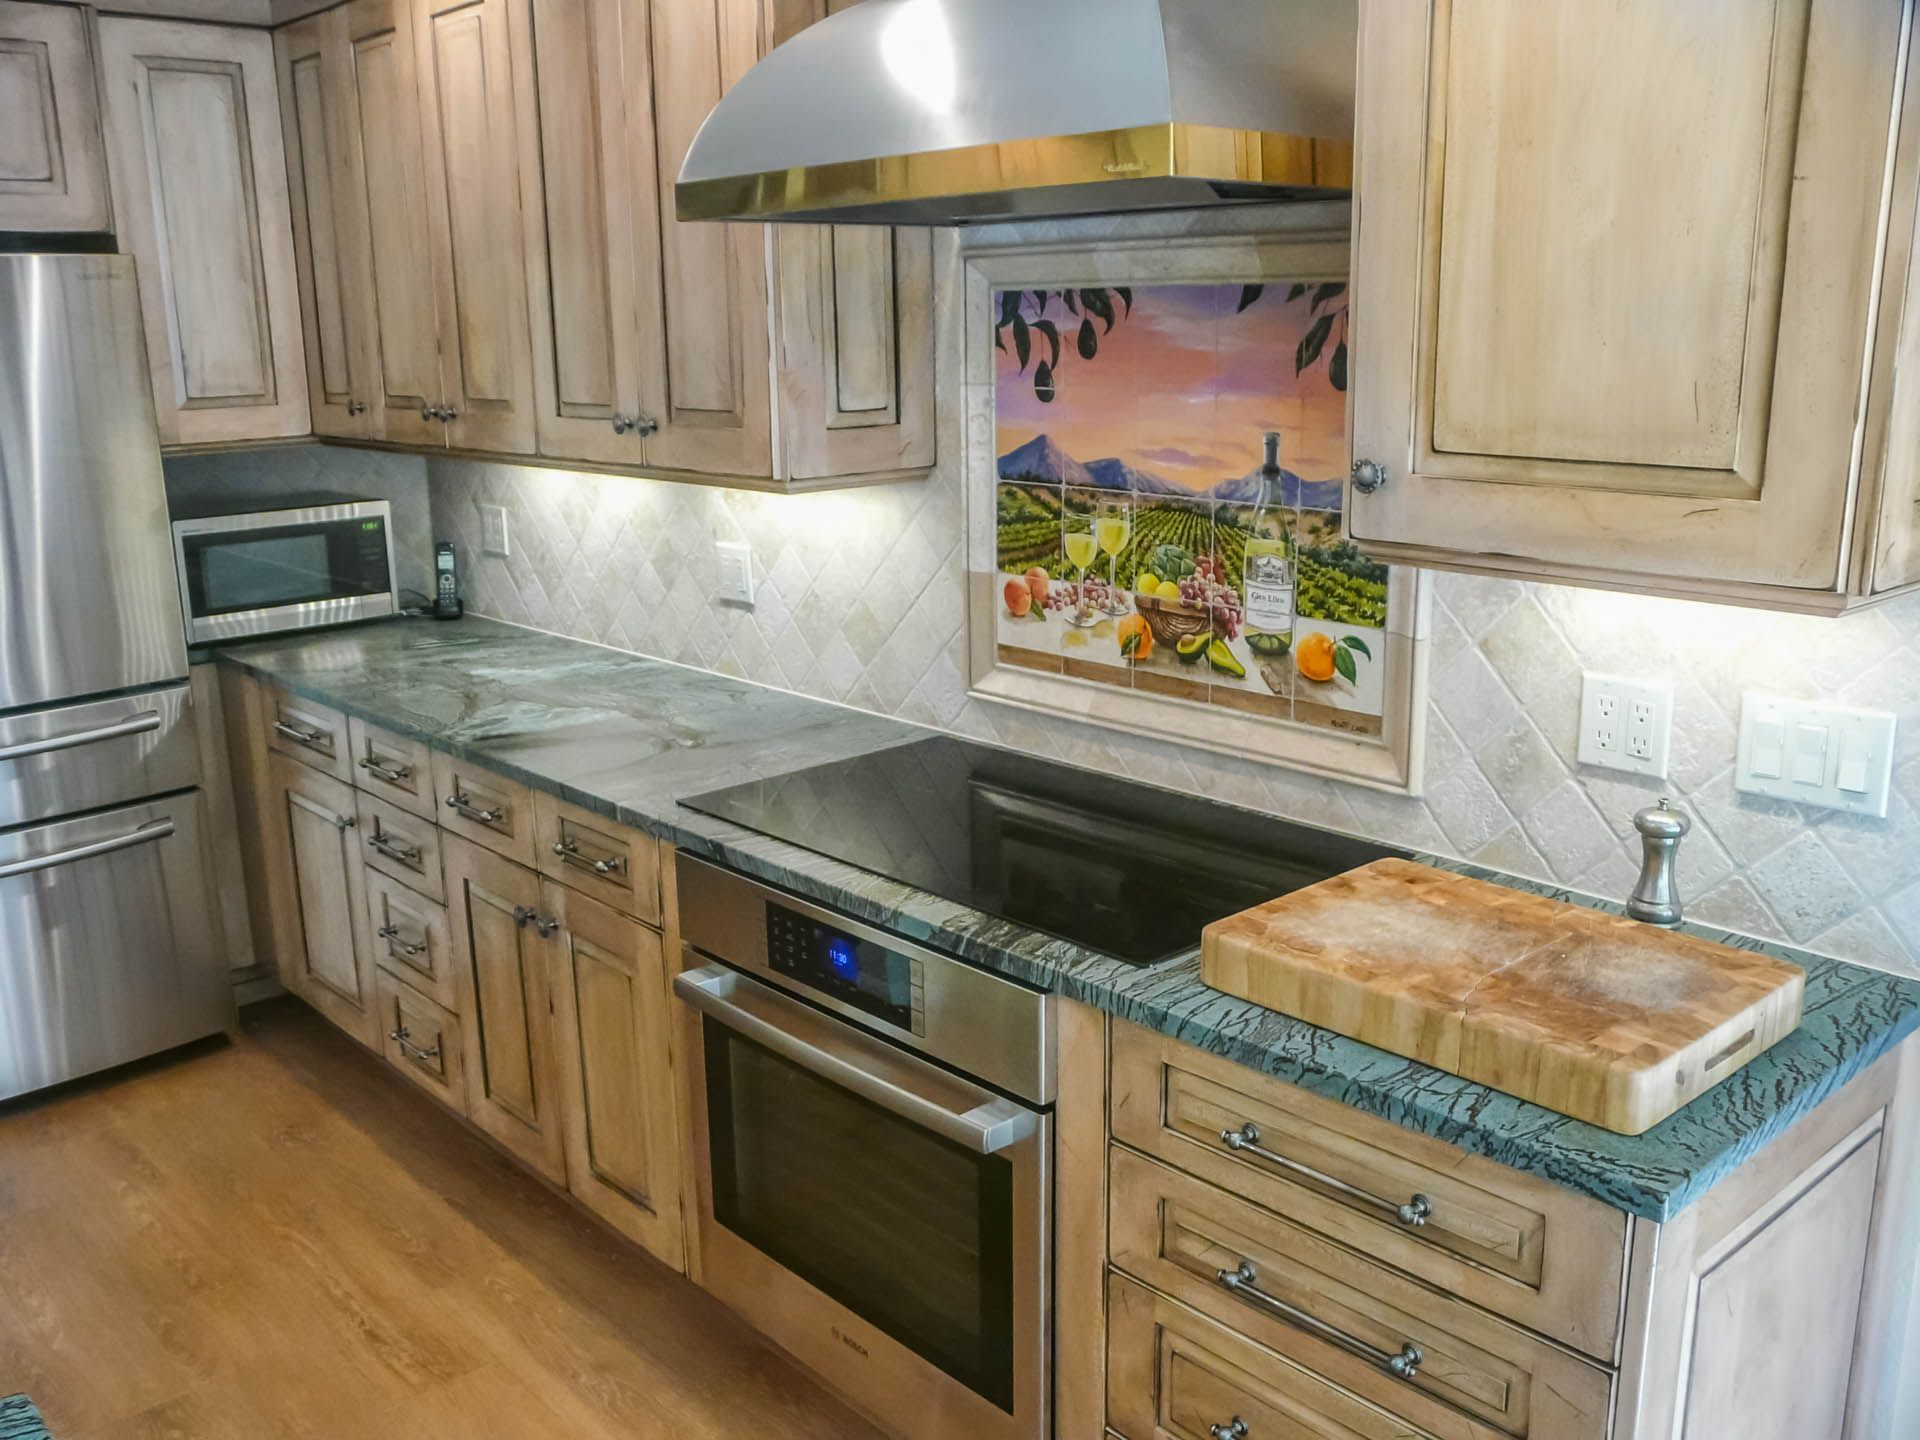 Base End Angle Cabinet Kitchen Cabinets And Flooring Kitchen Remodel Design Kitchen Design